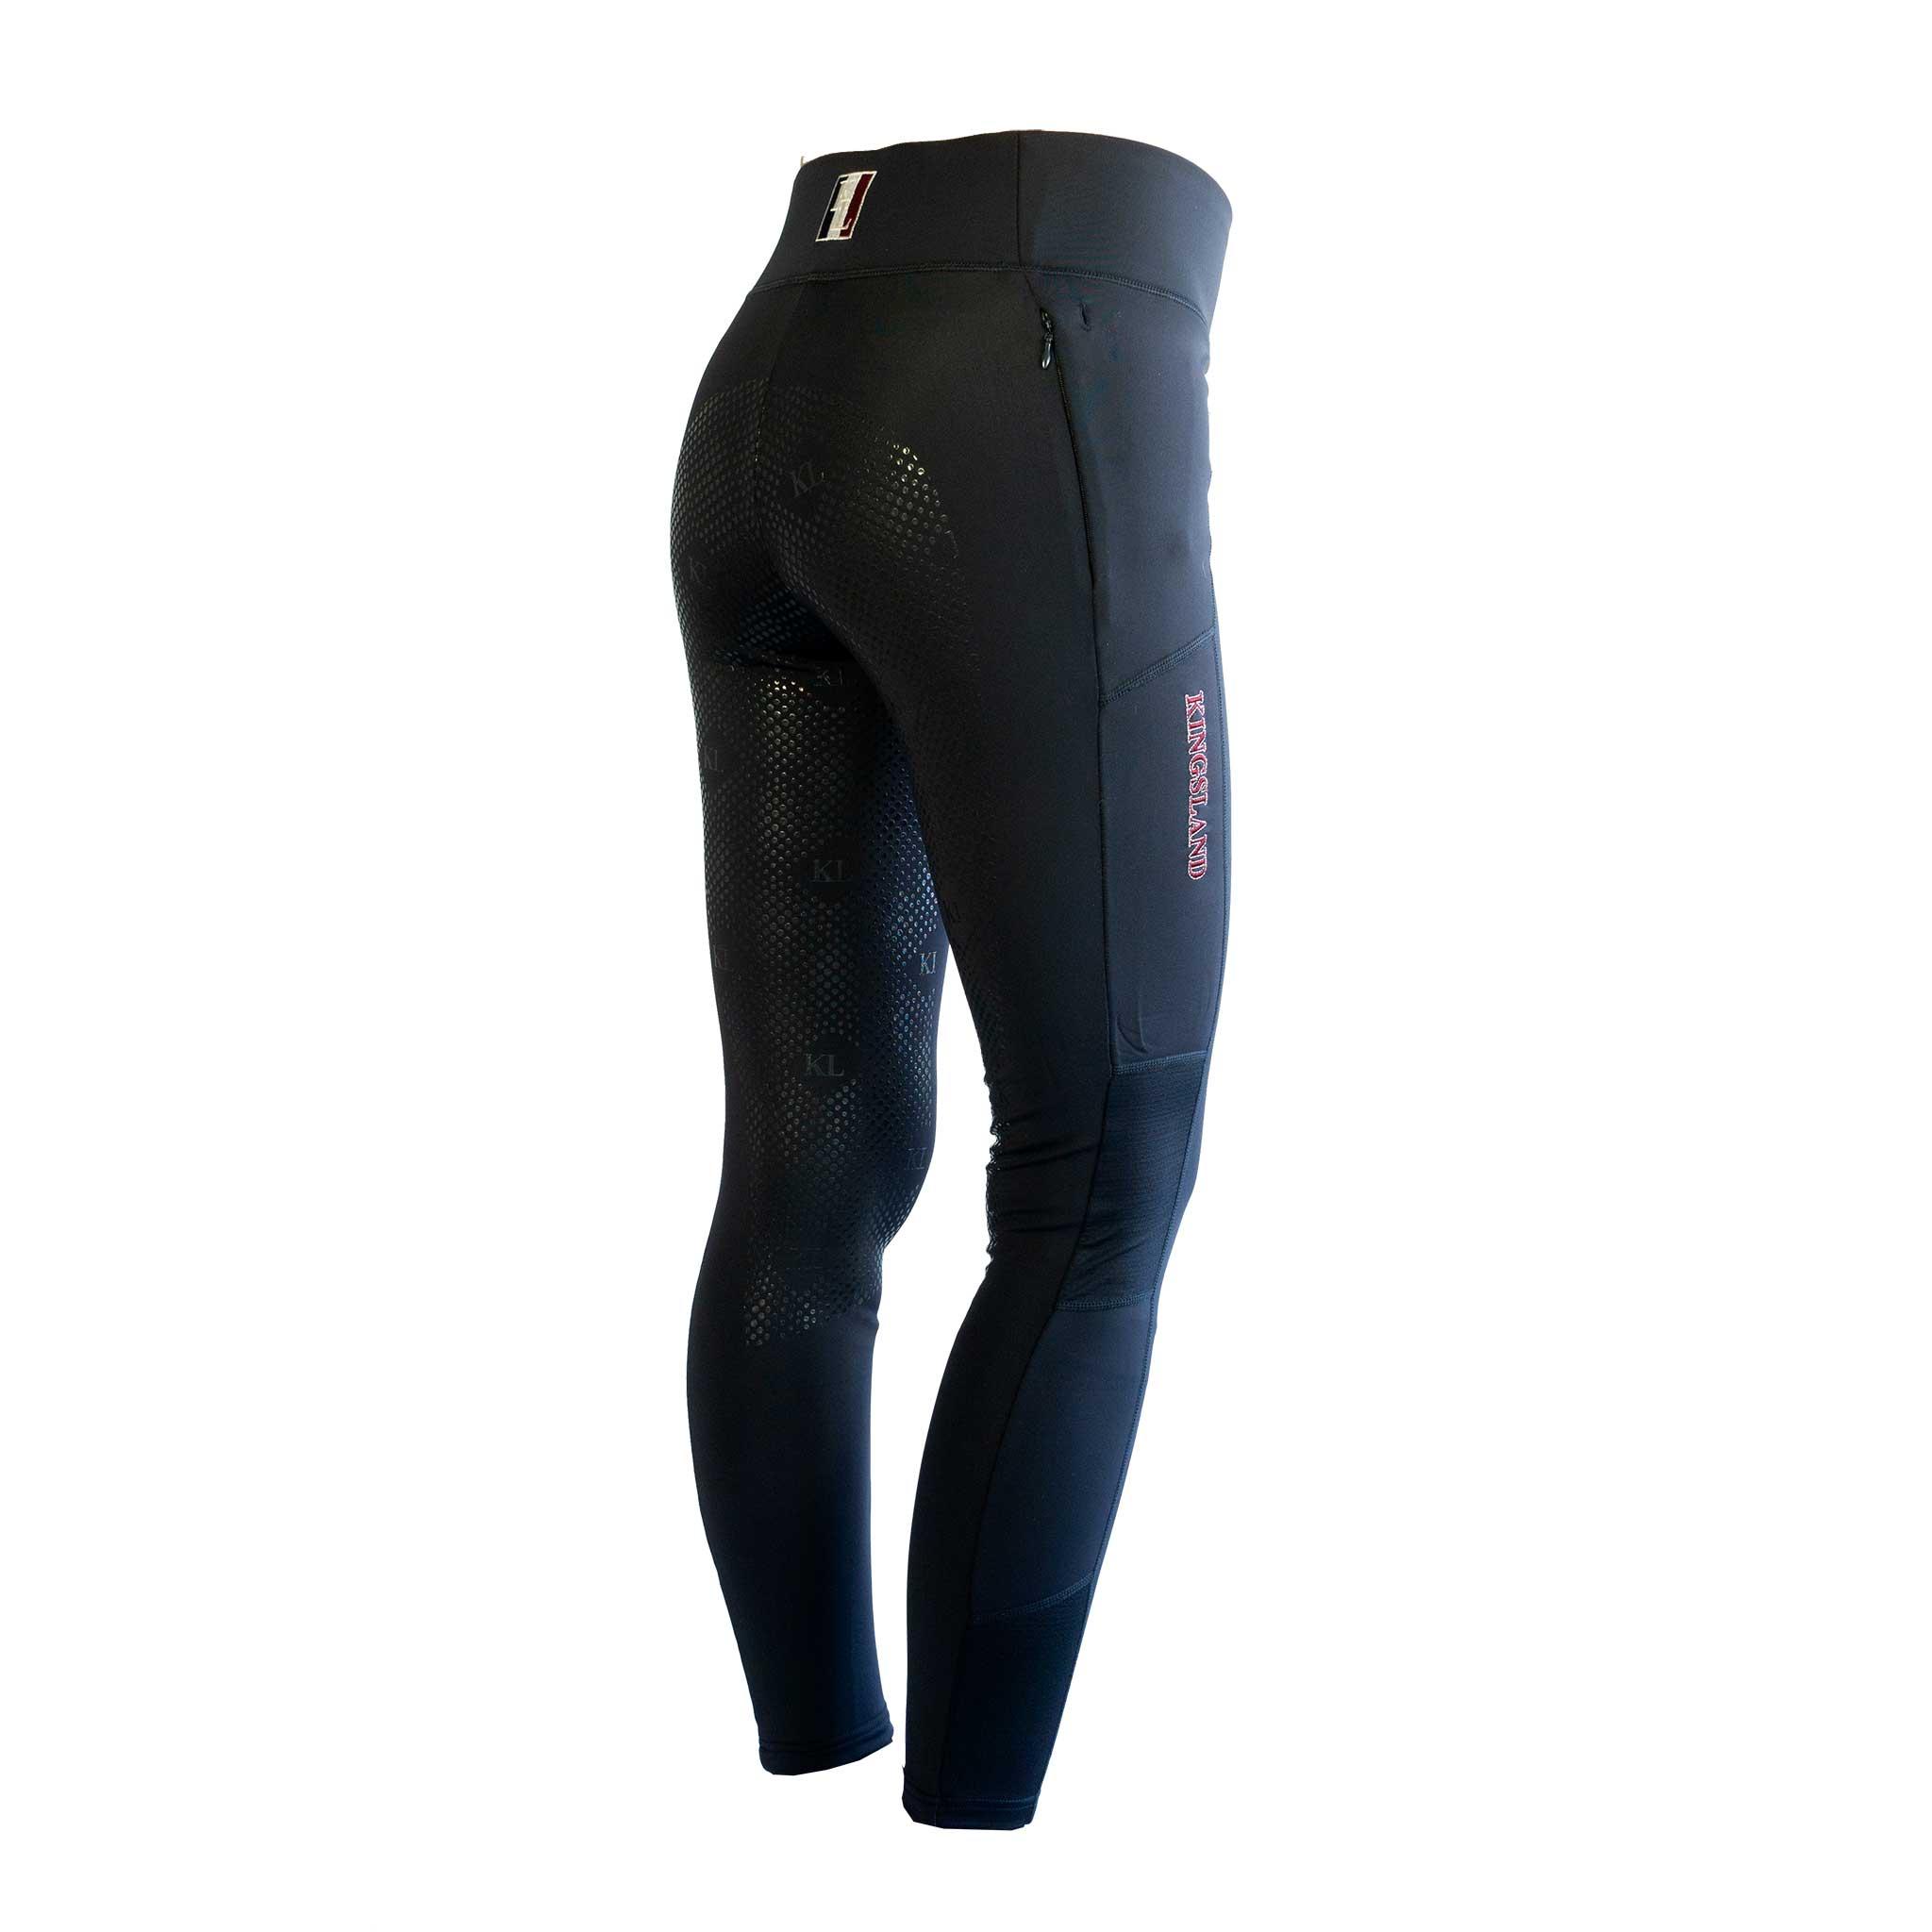 Kingsland Katinka Ladies F-TEC2 full grip tights -ratsastusleggingsit kokopaikoilla